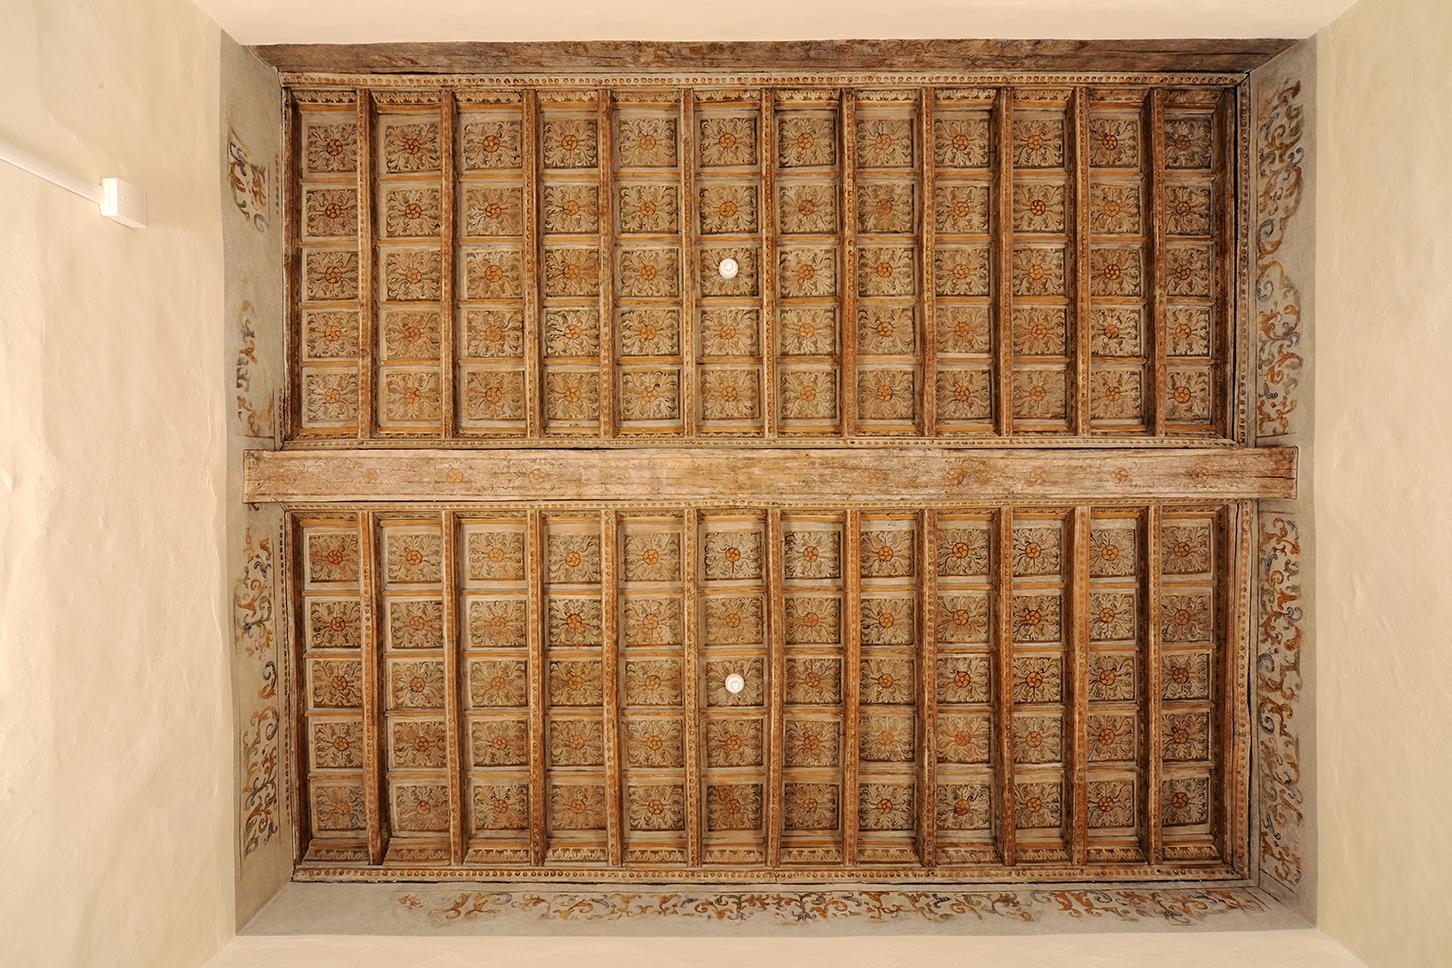 Restauro di soffitti lignei e boiserie torino restauro pulitura